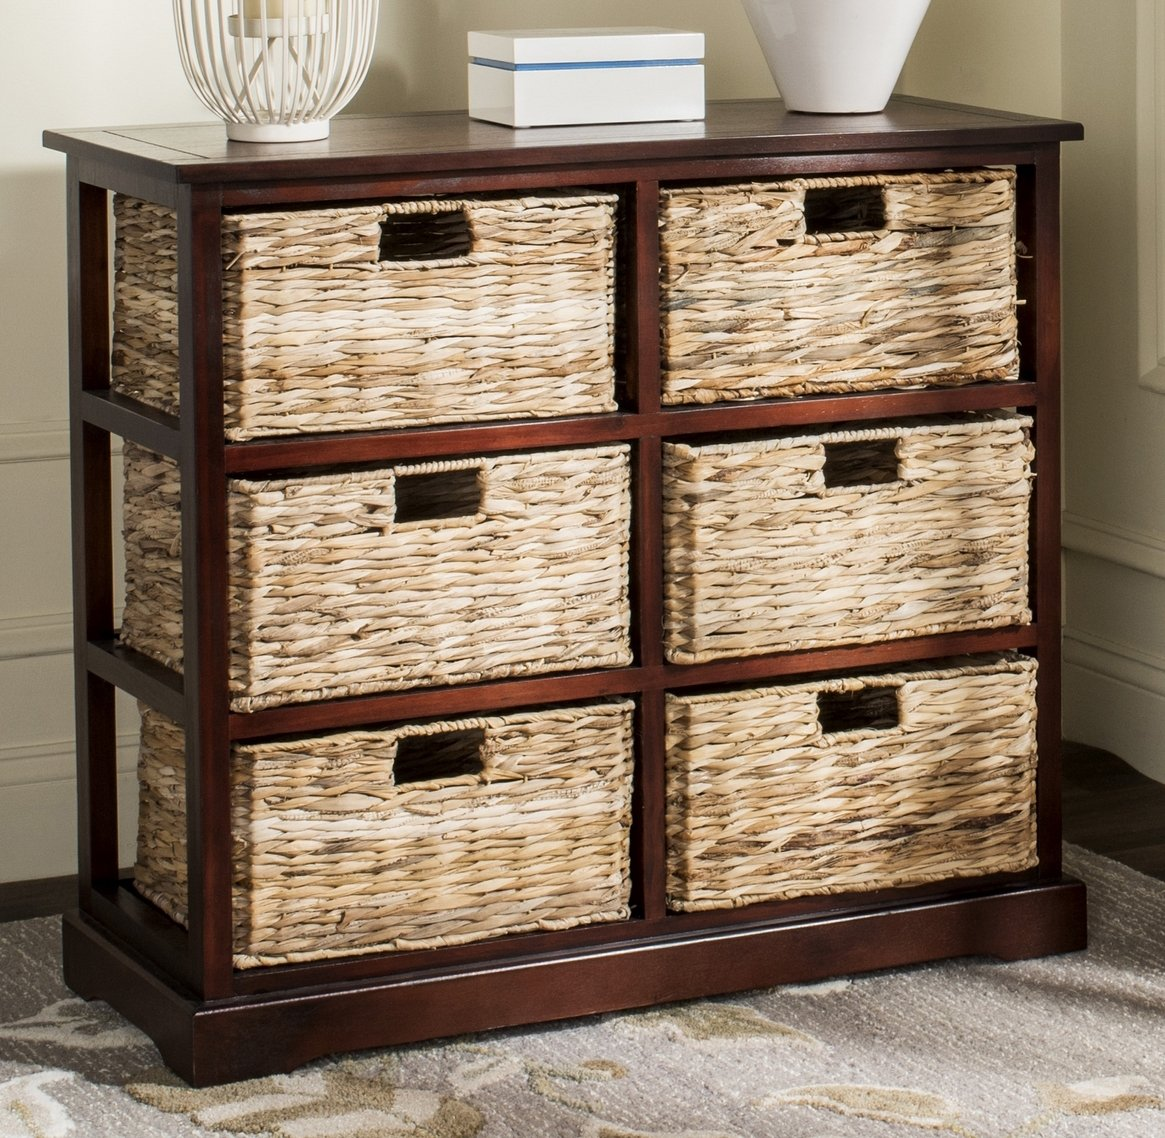 Safavieh American Homes Collection Keenan Cherry 6 Wicker Basket Storage Chest